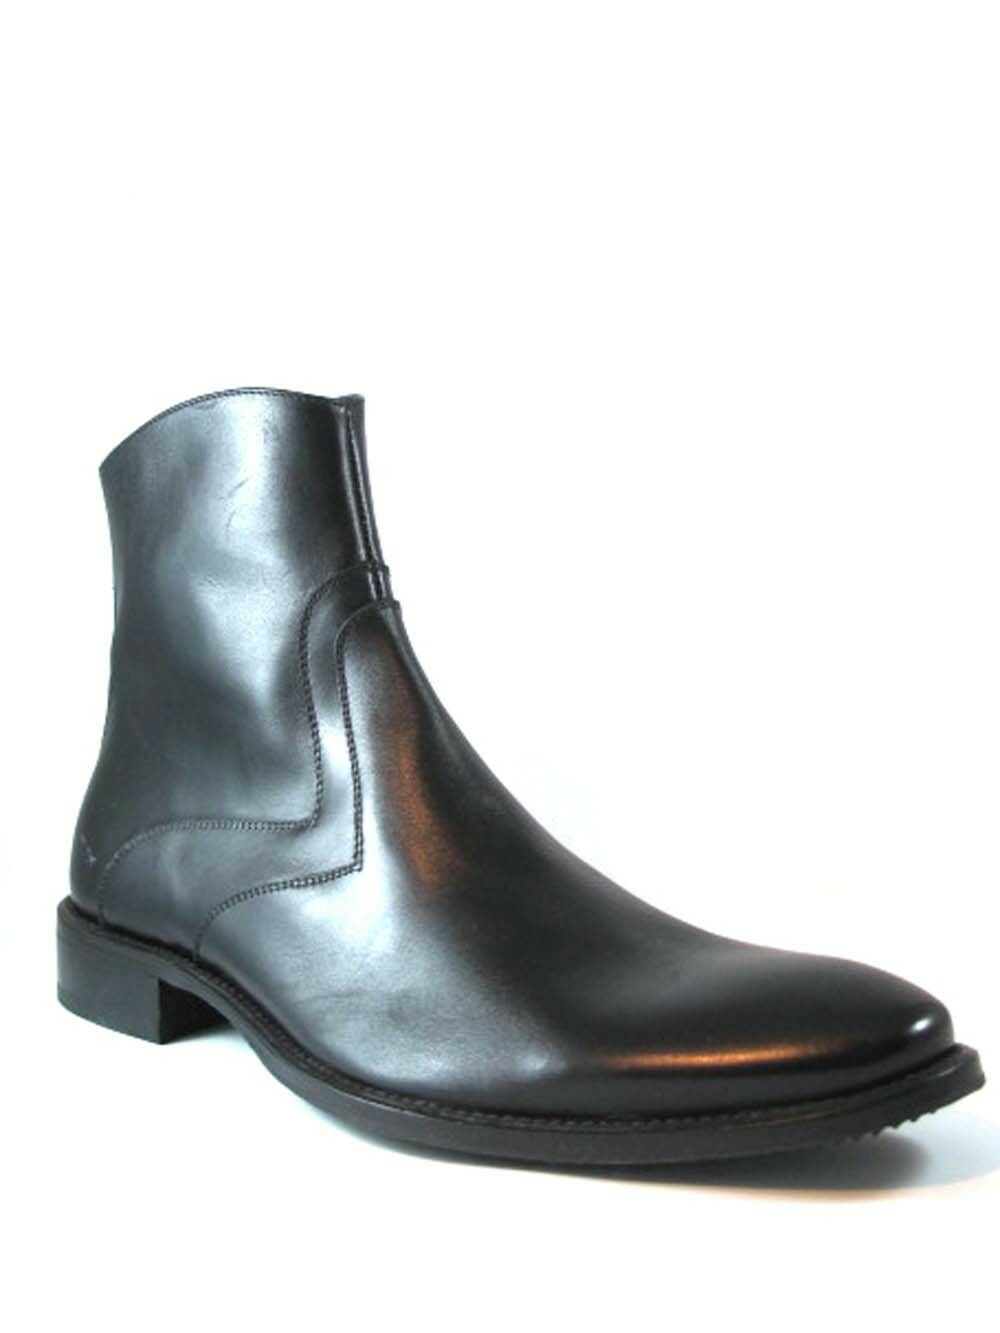 Morandi Men's 4086 Leather Dressy Italian Ankle Boots